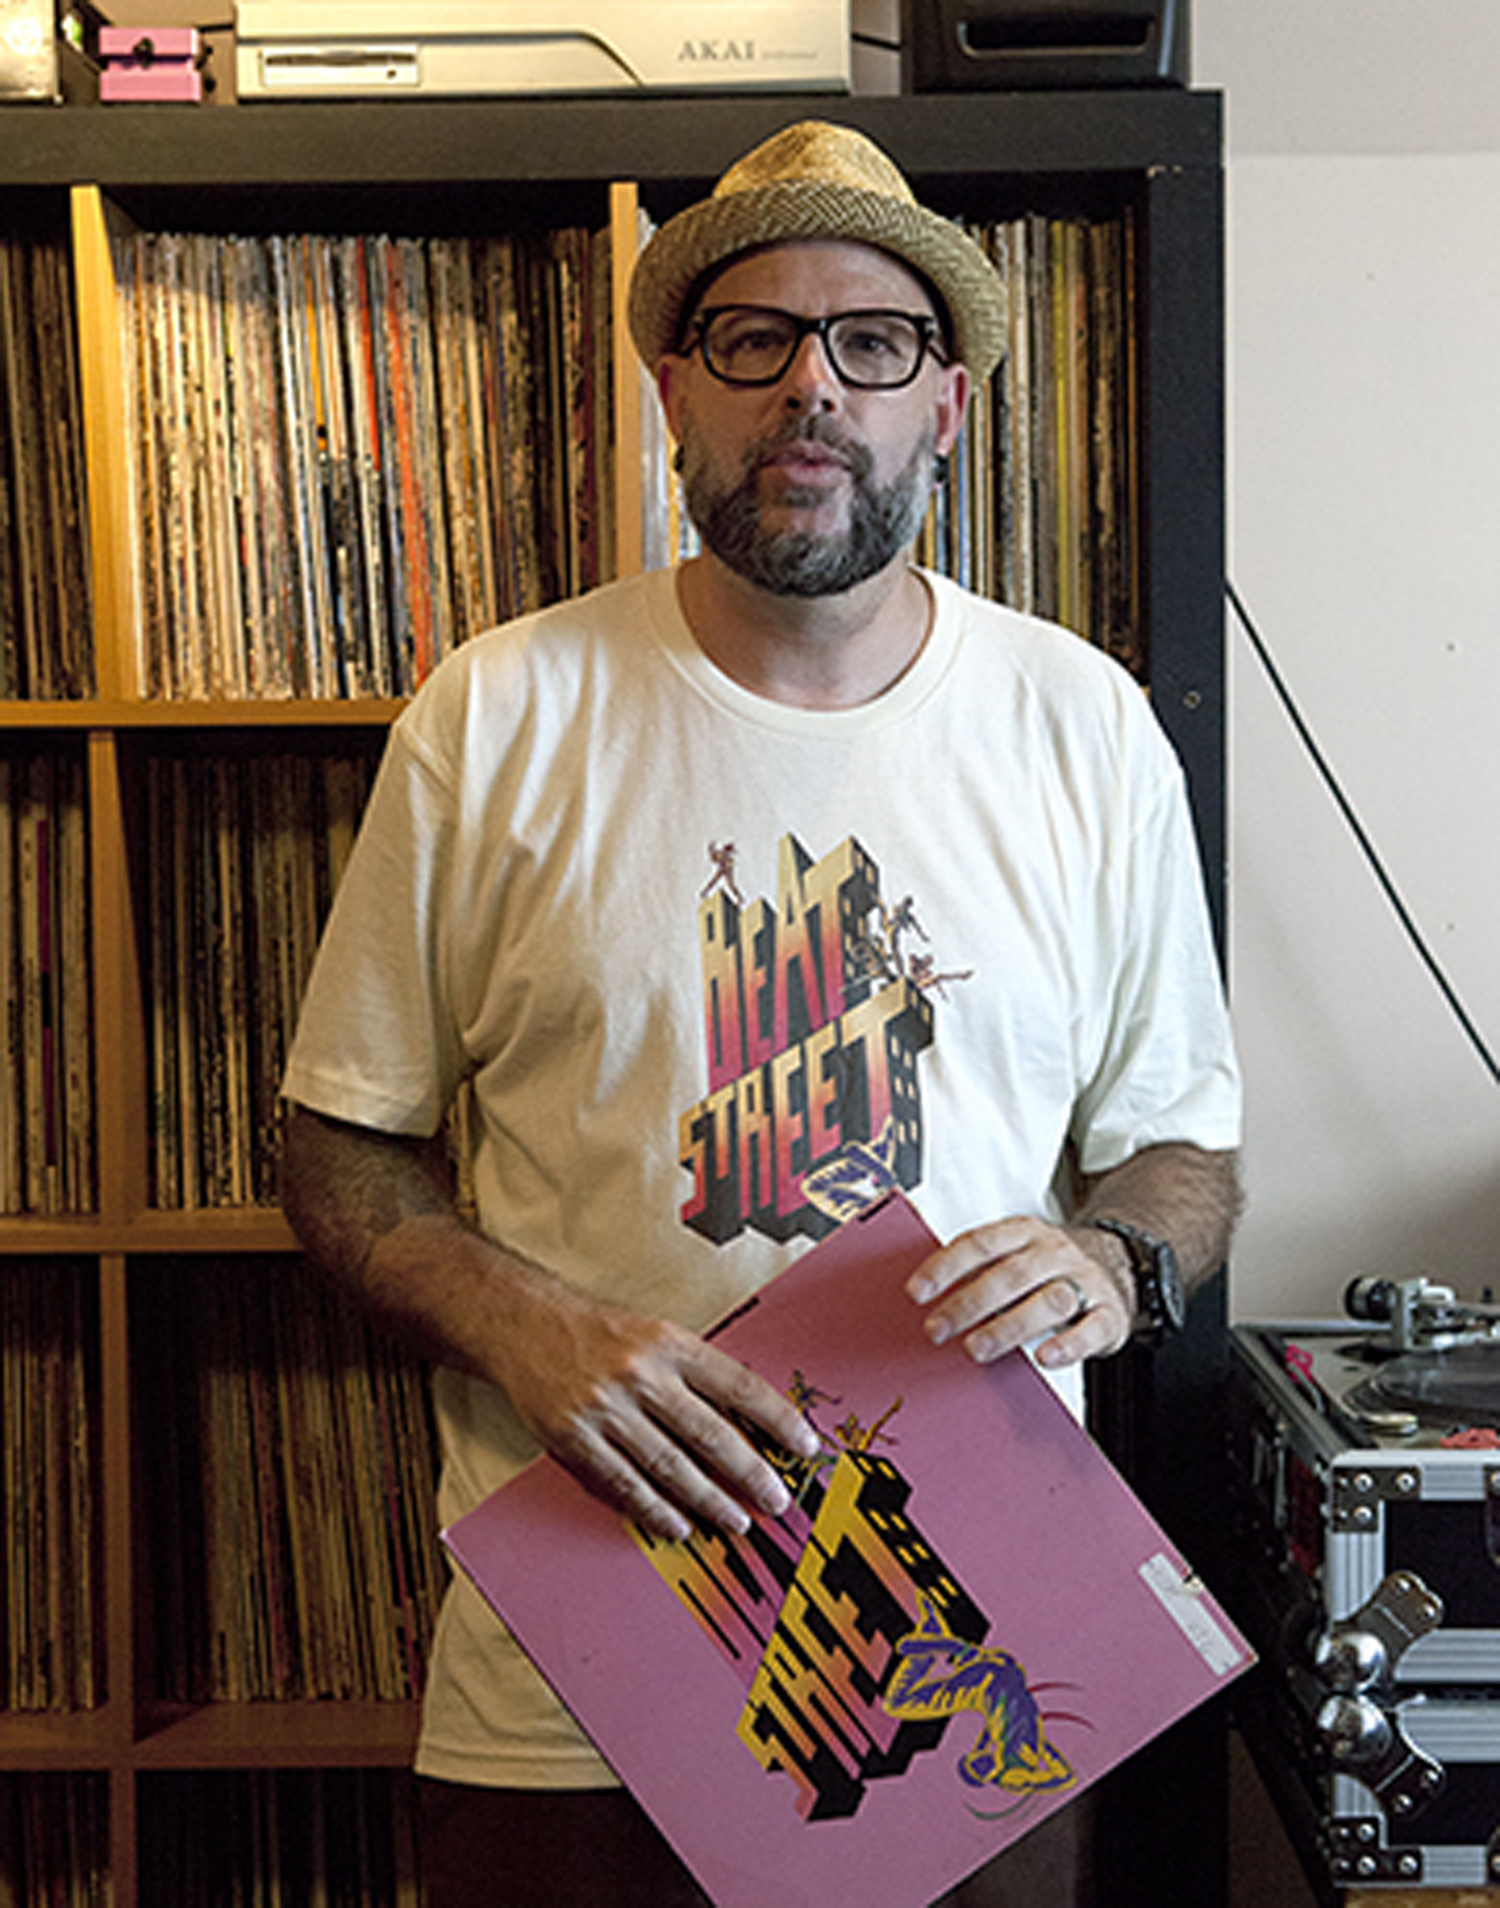 Jamison Harvey a.k.a. DJ Prestige